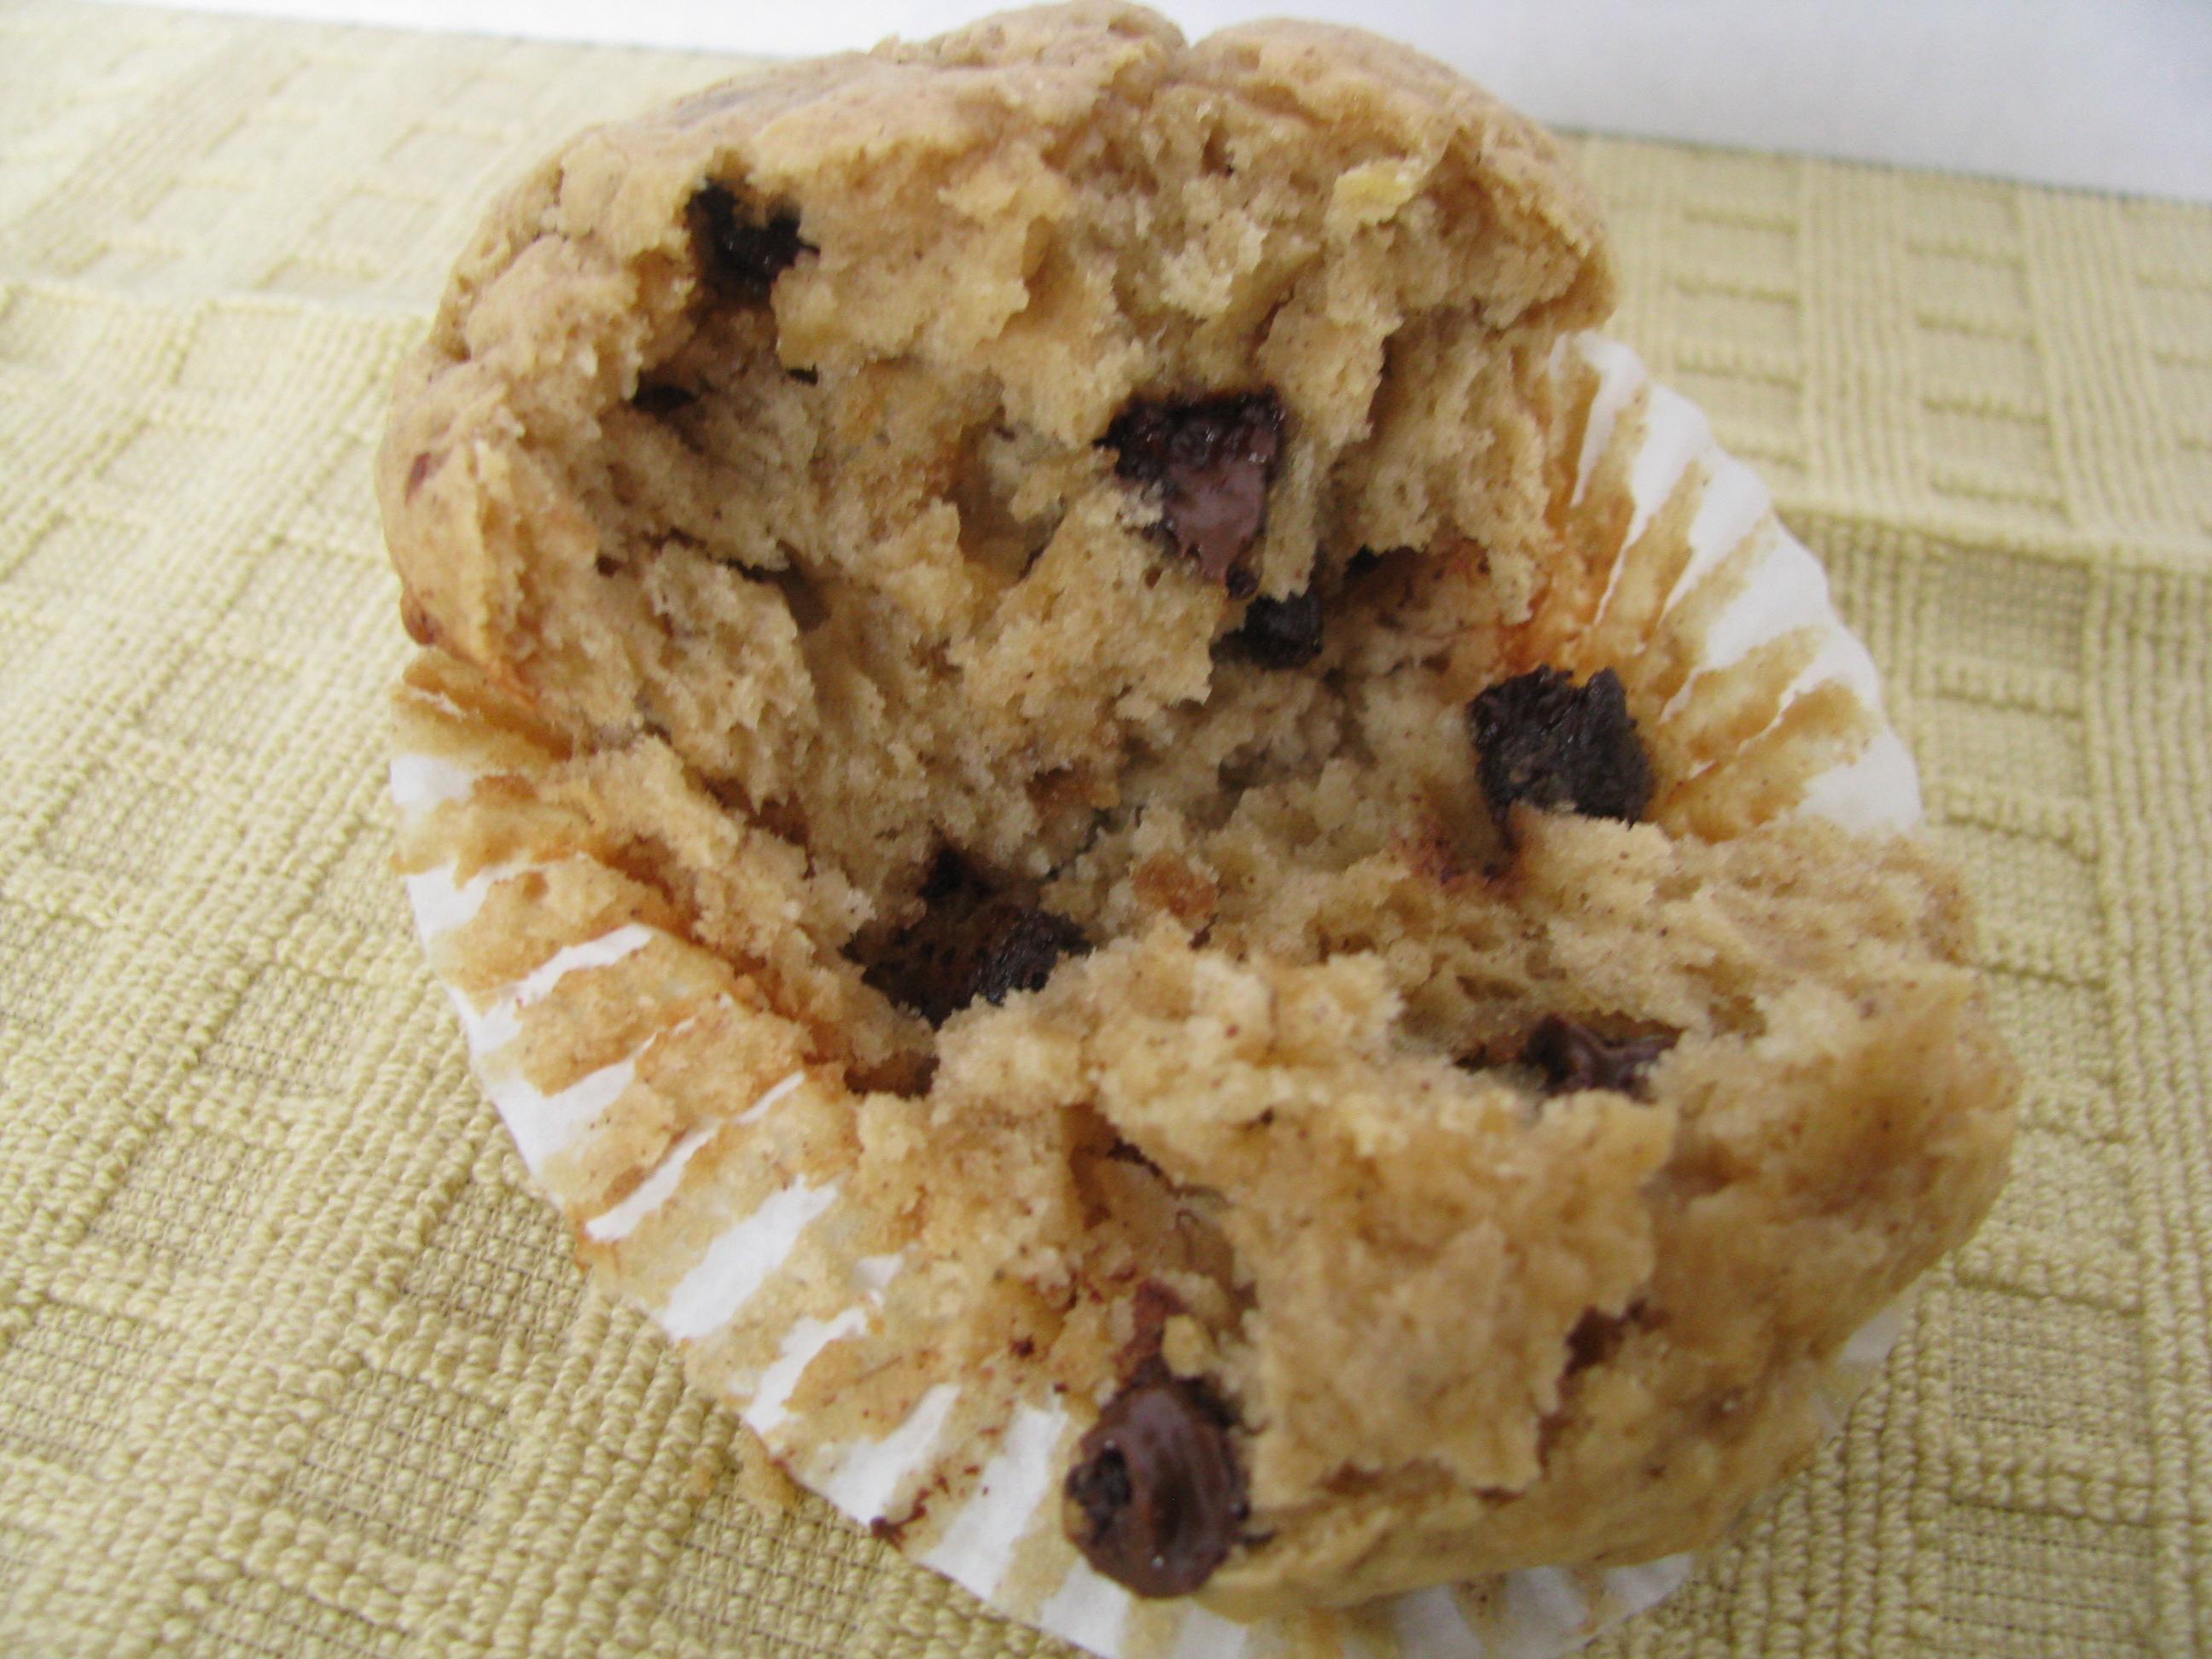 peanut butter banana chocolate chip muffins yields 18 muffins